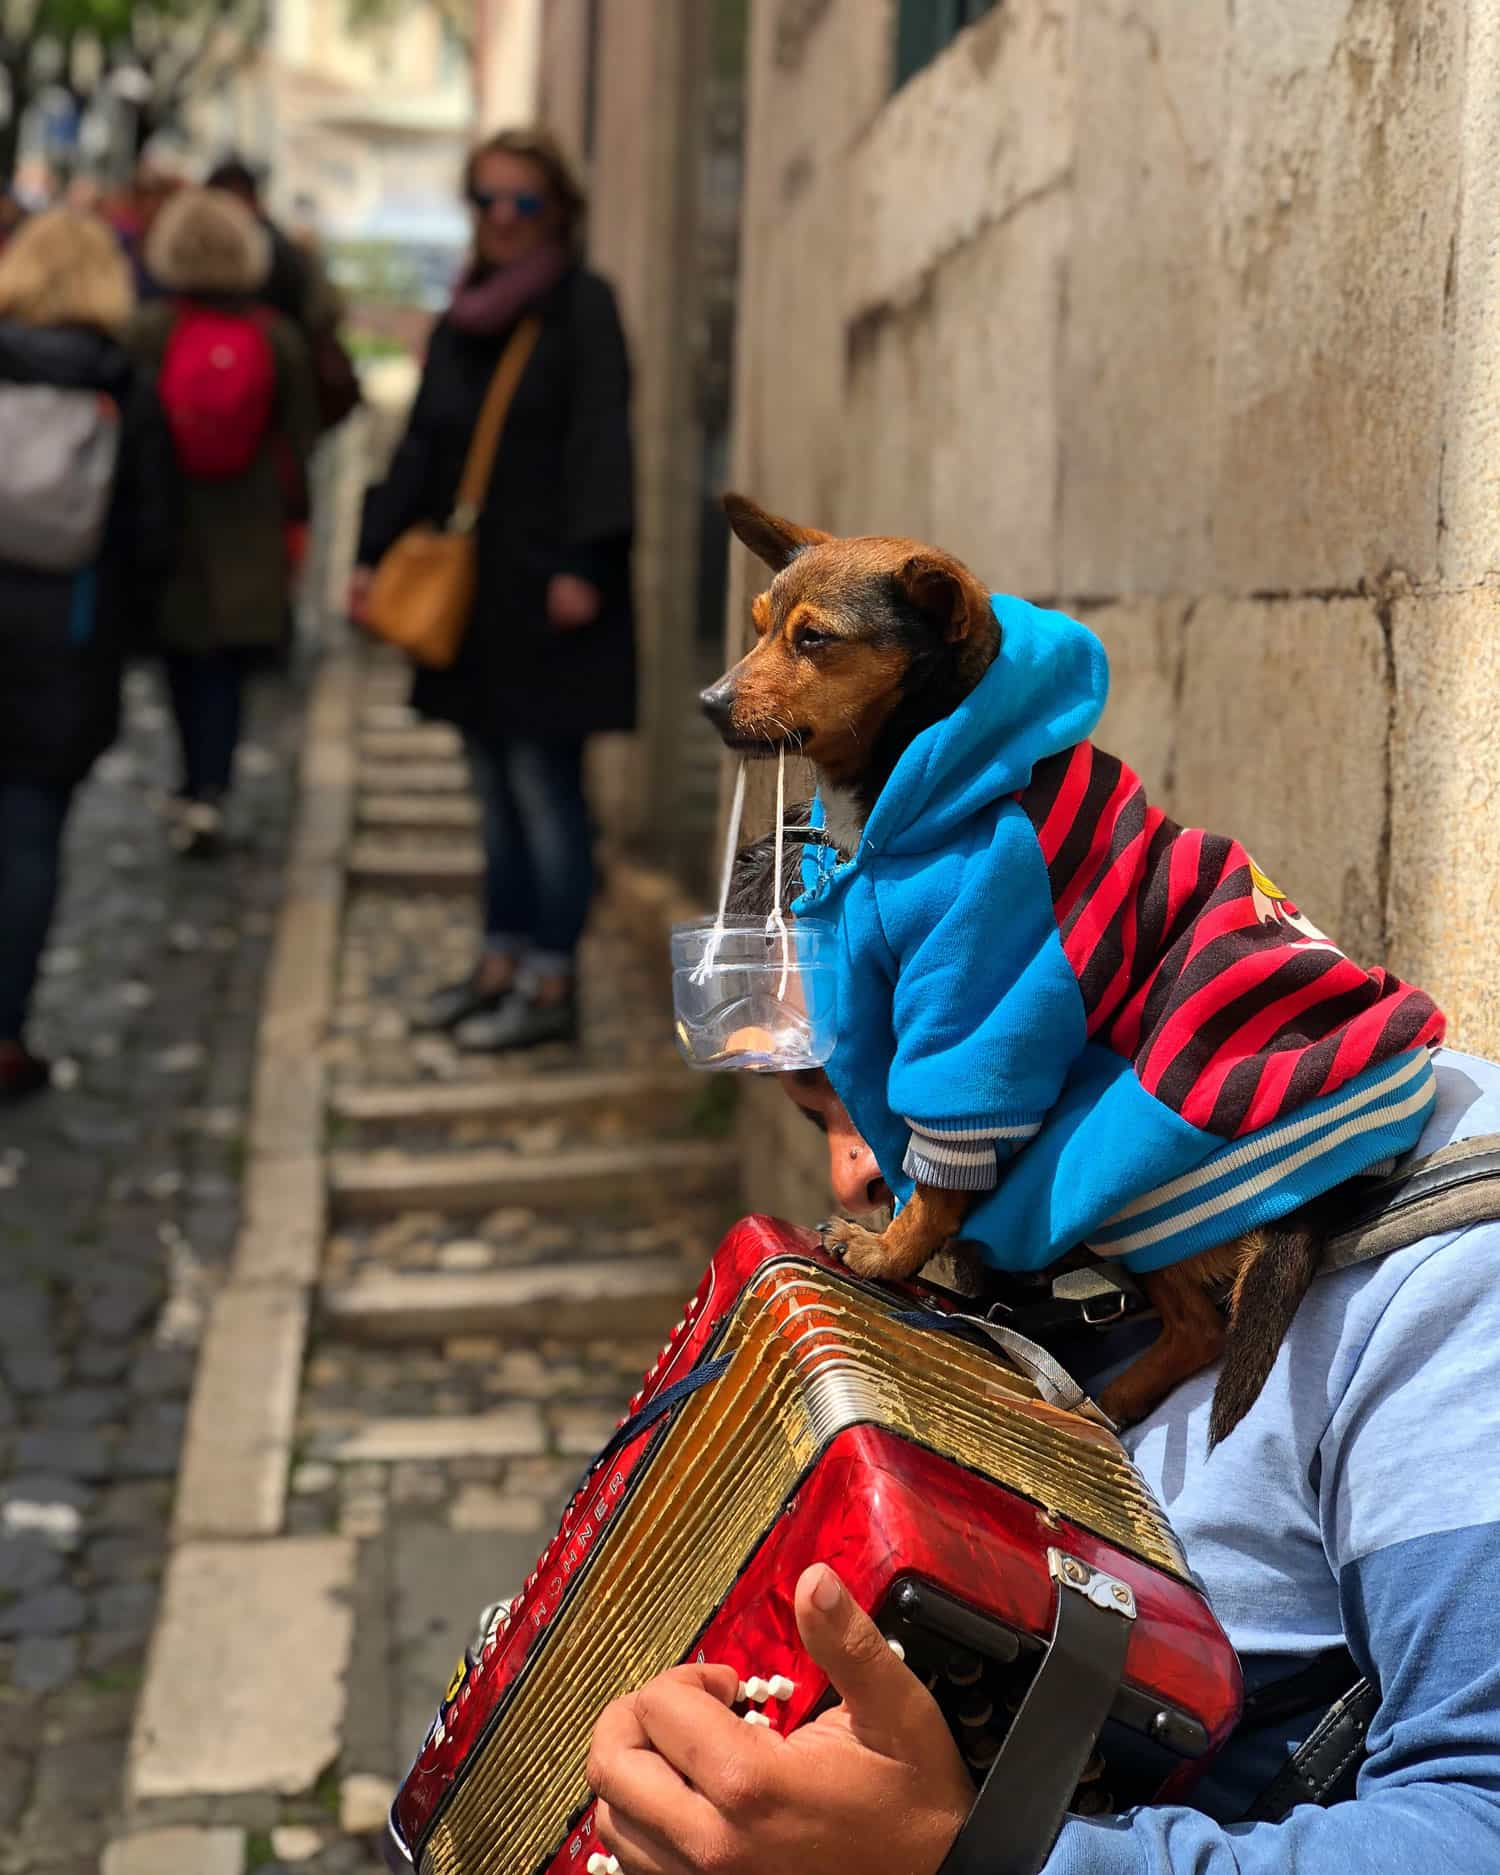 Dog by Ed Stennett